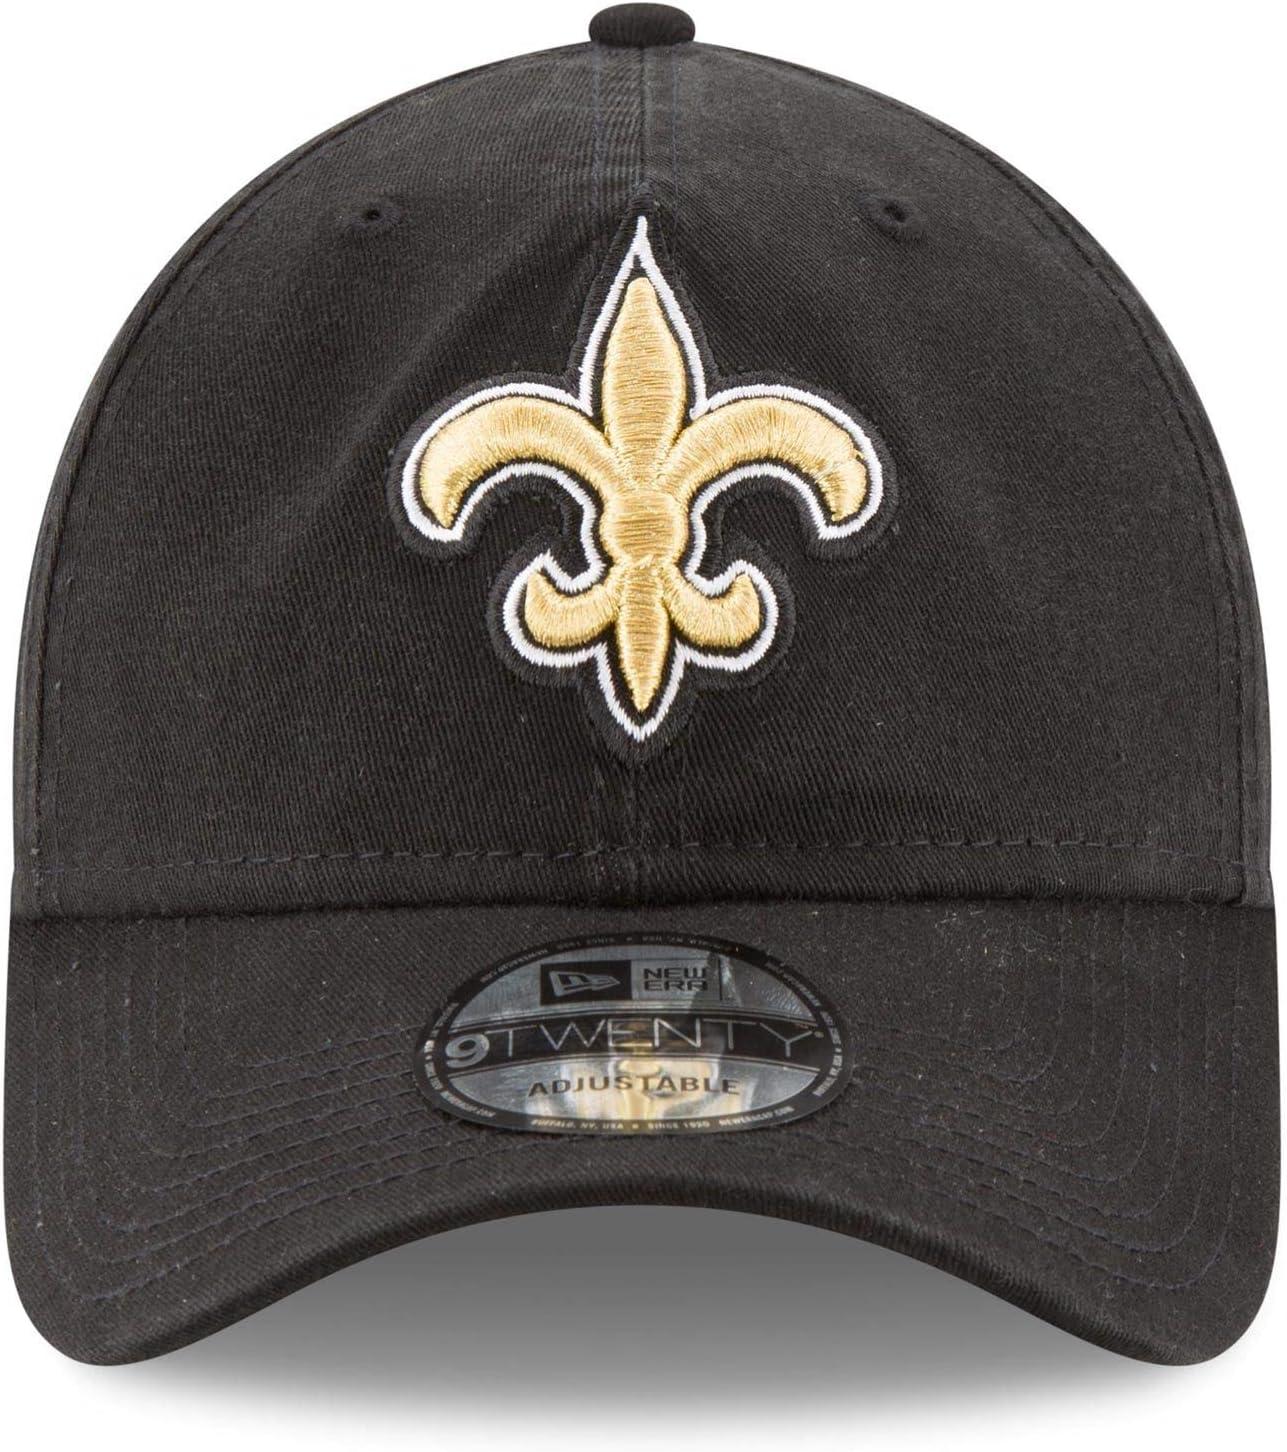 New Era New Orleans Saints 9TWENTY Core Black One Size Fits All